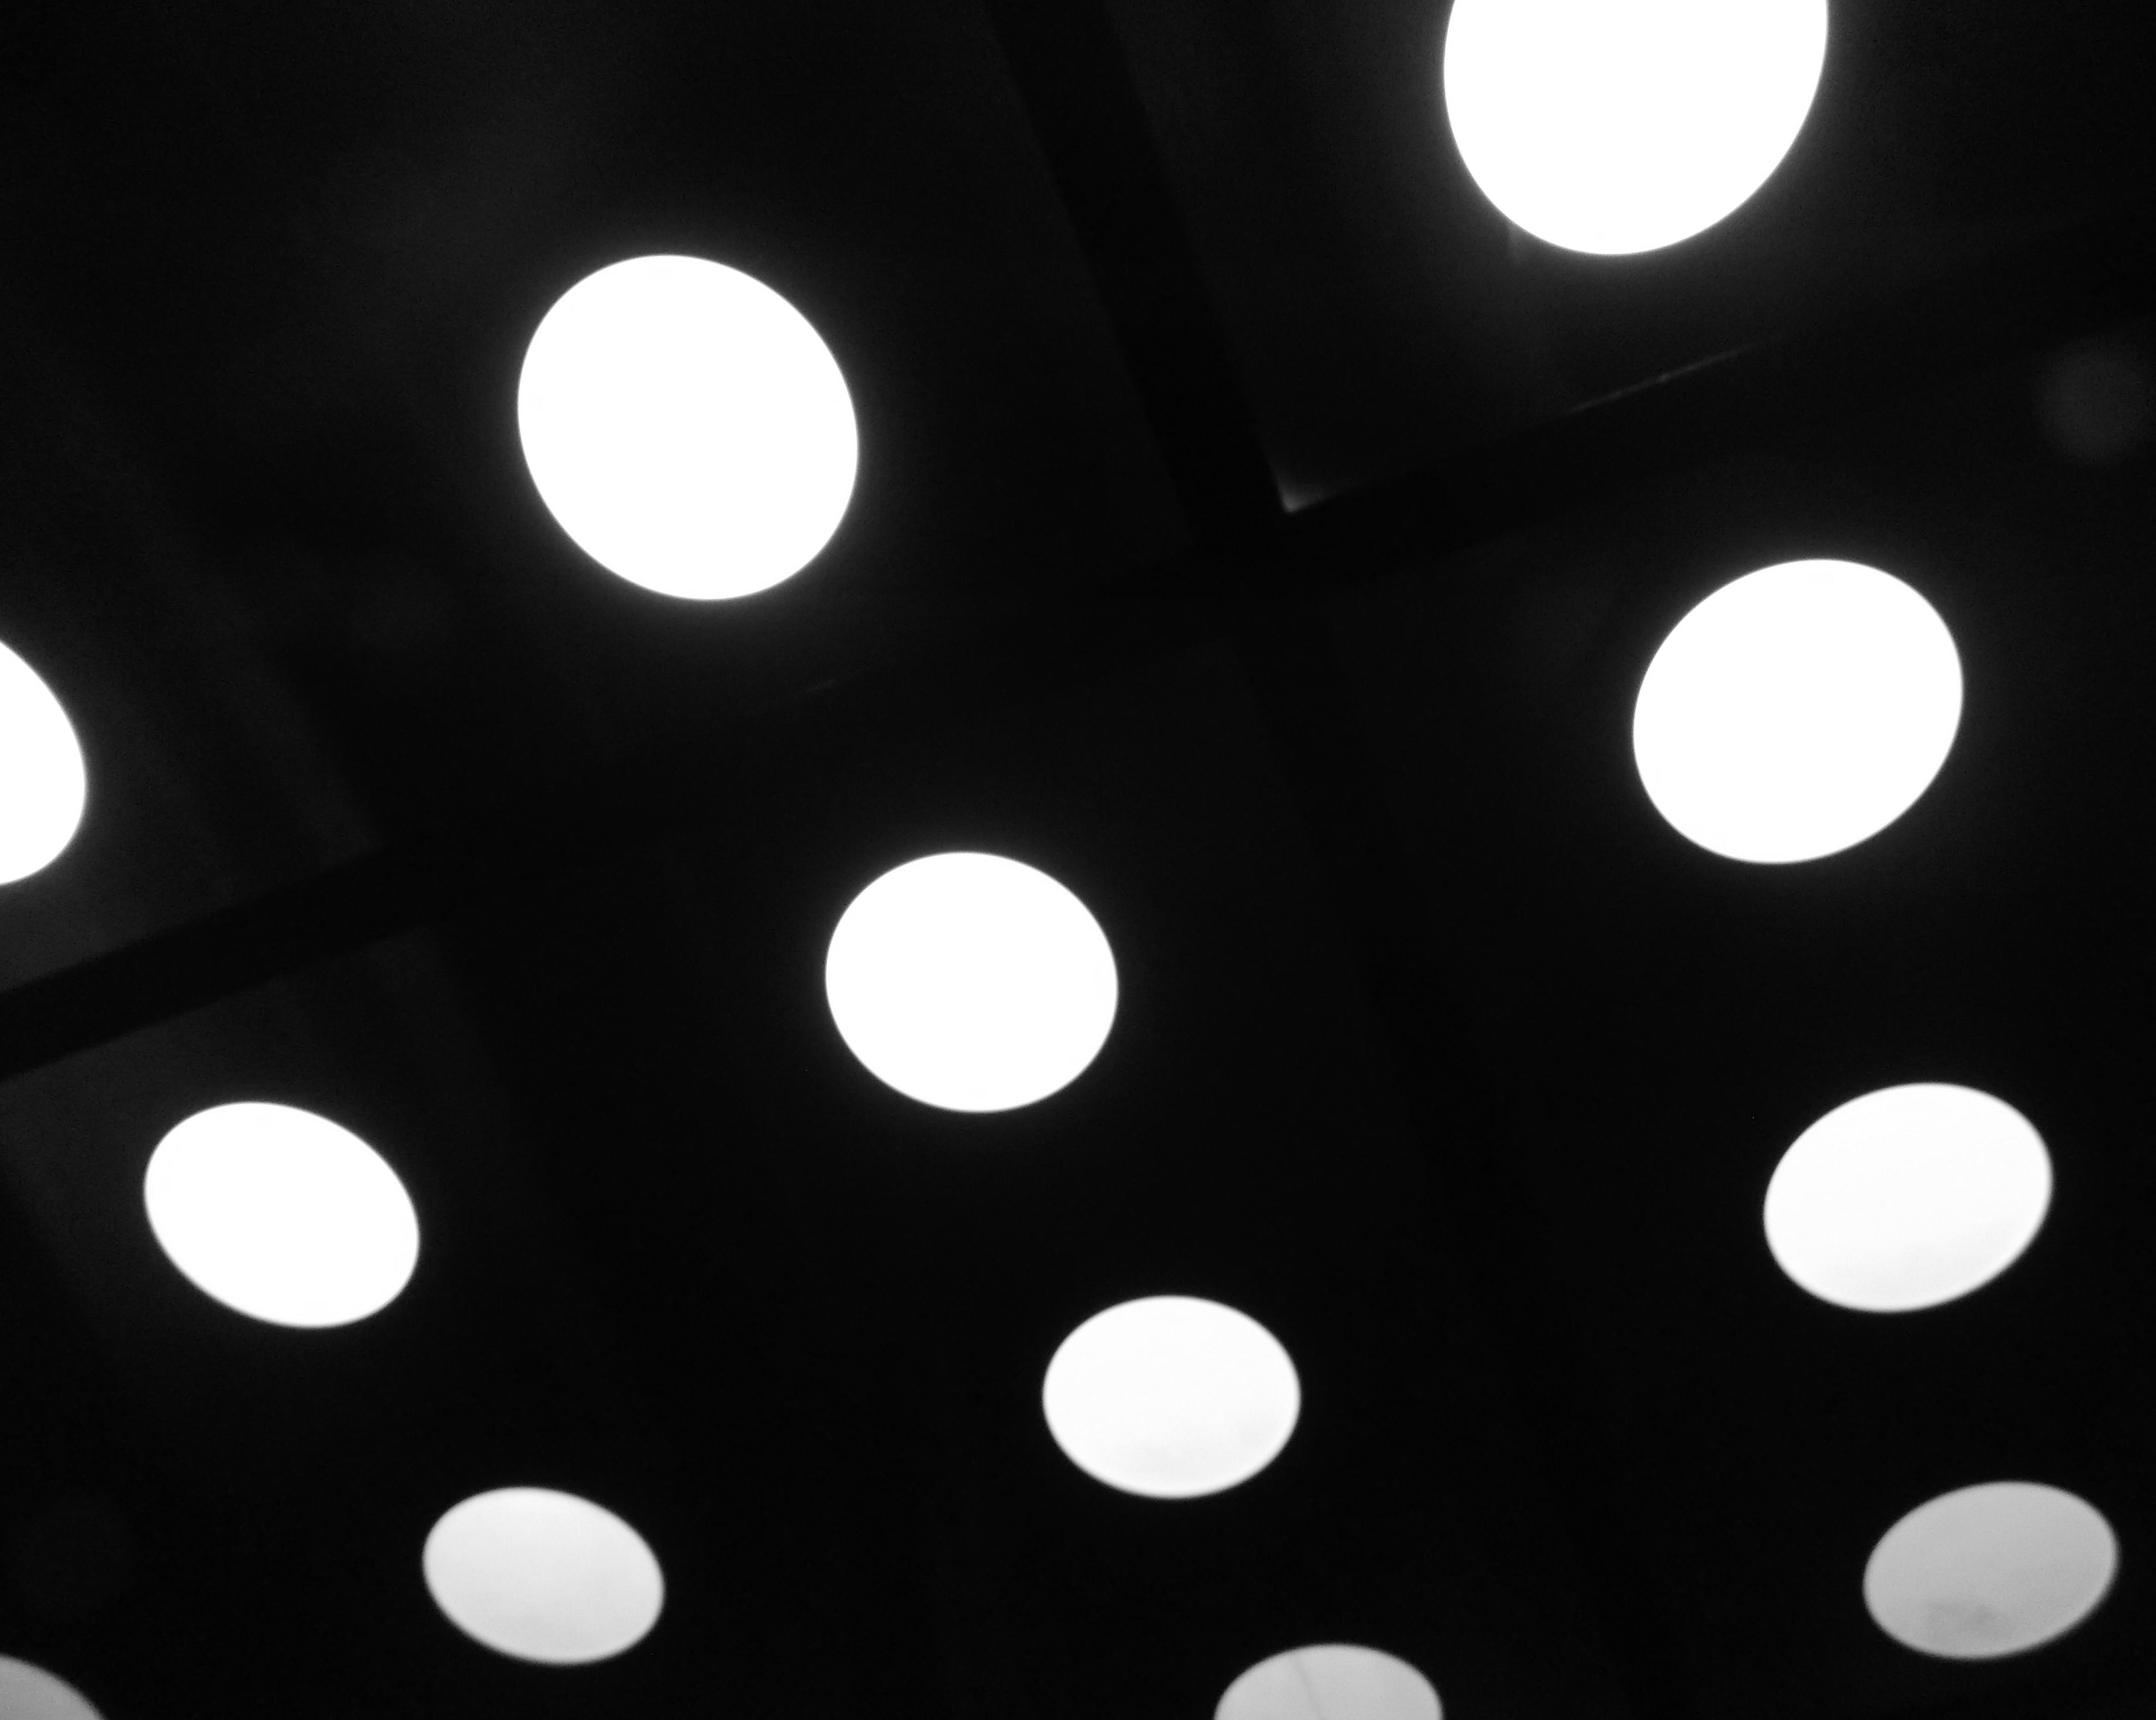 ceiling of parking garage